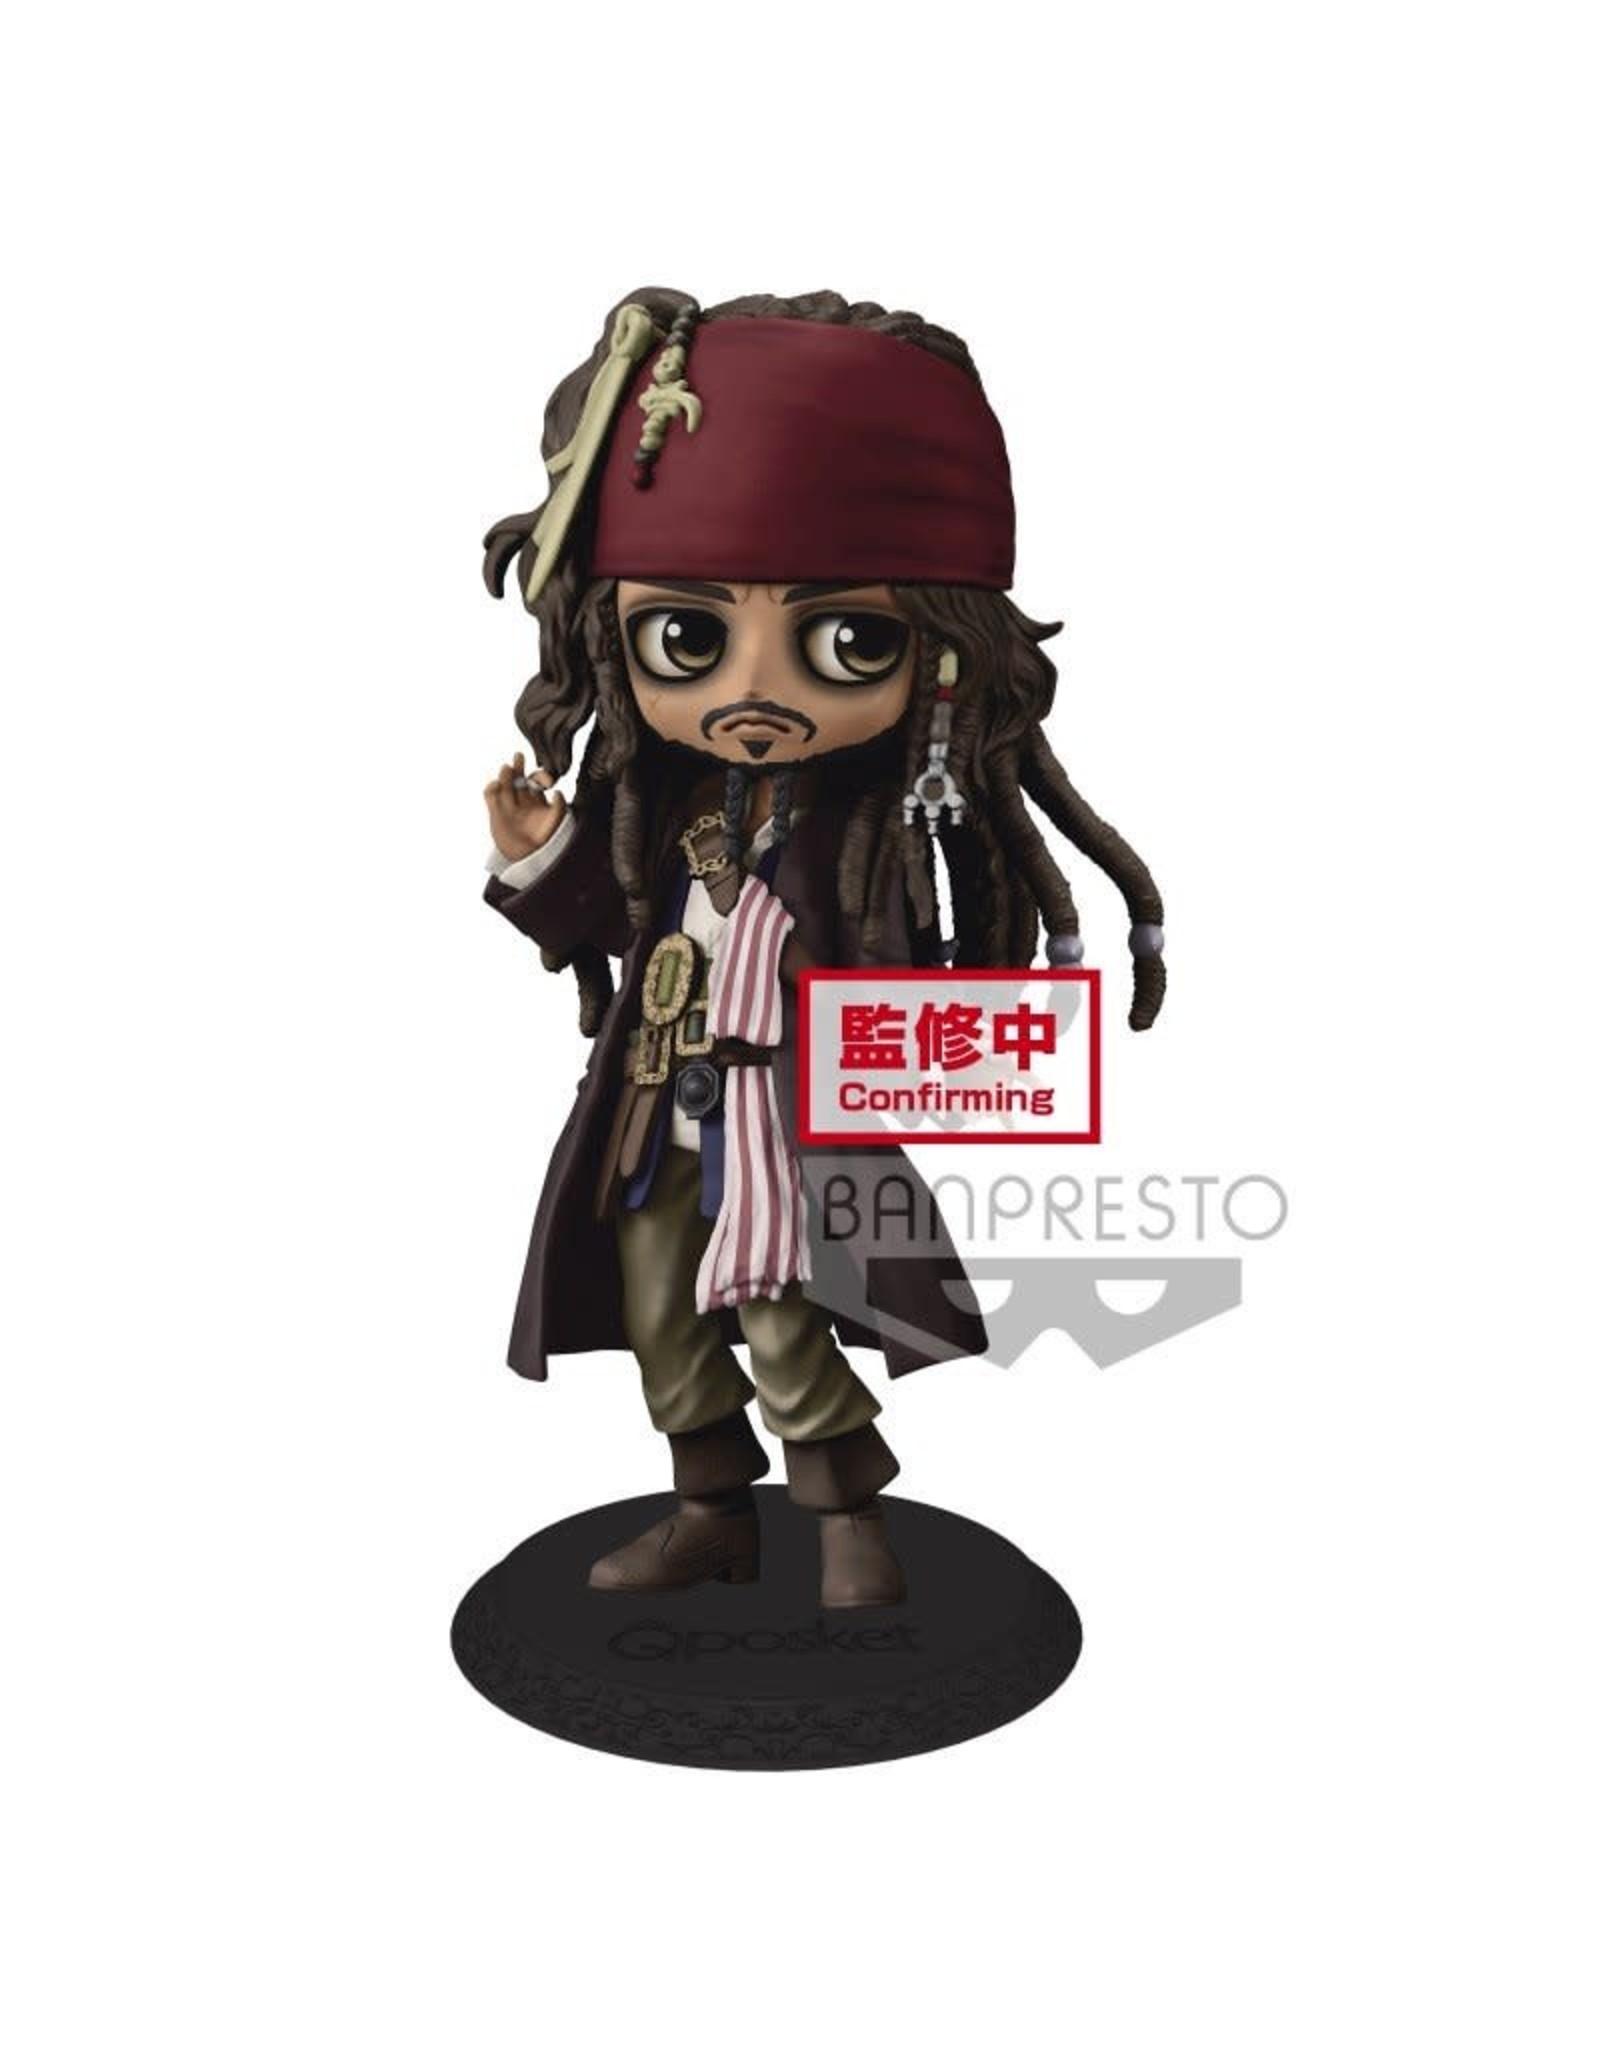 Banpresto DISNEY Q Posket Figure 14cm -Jack Sparrow